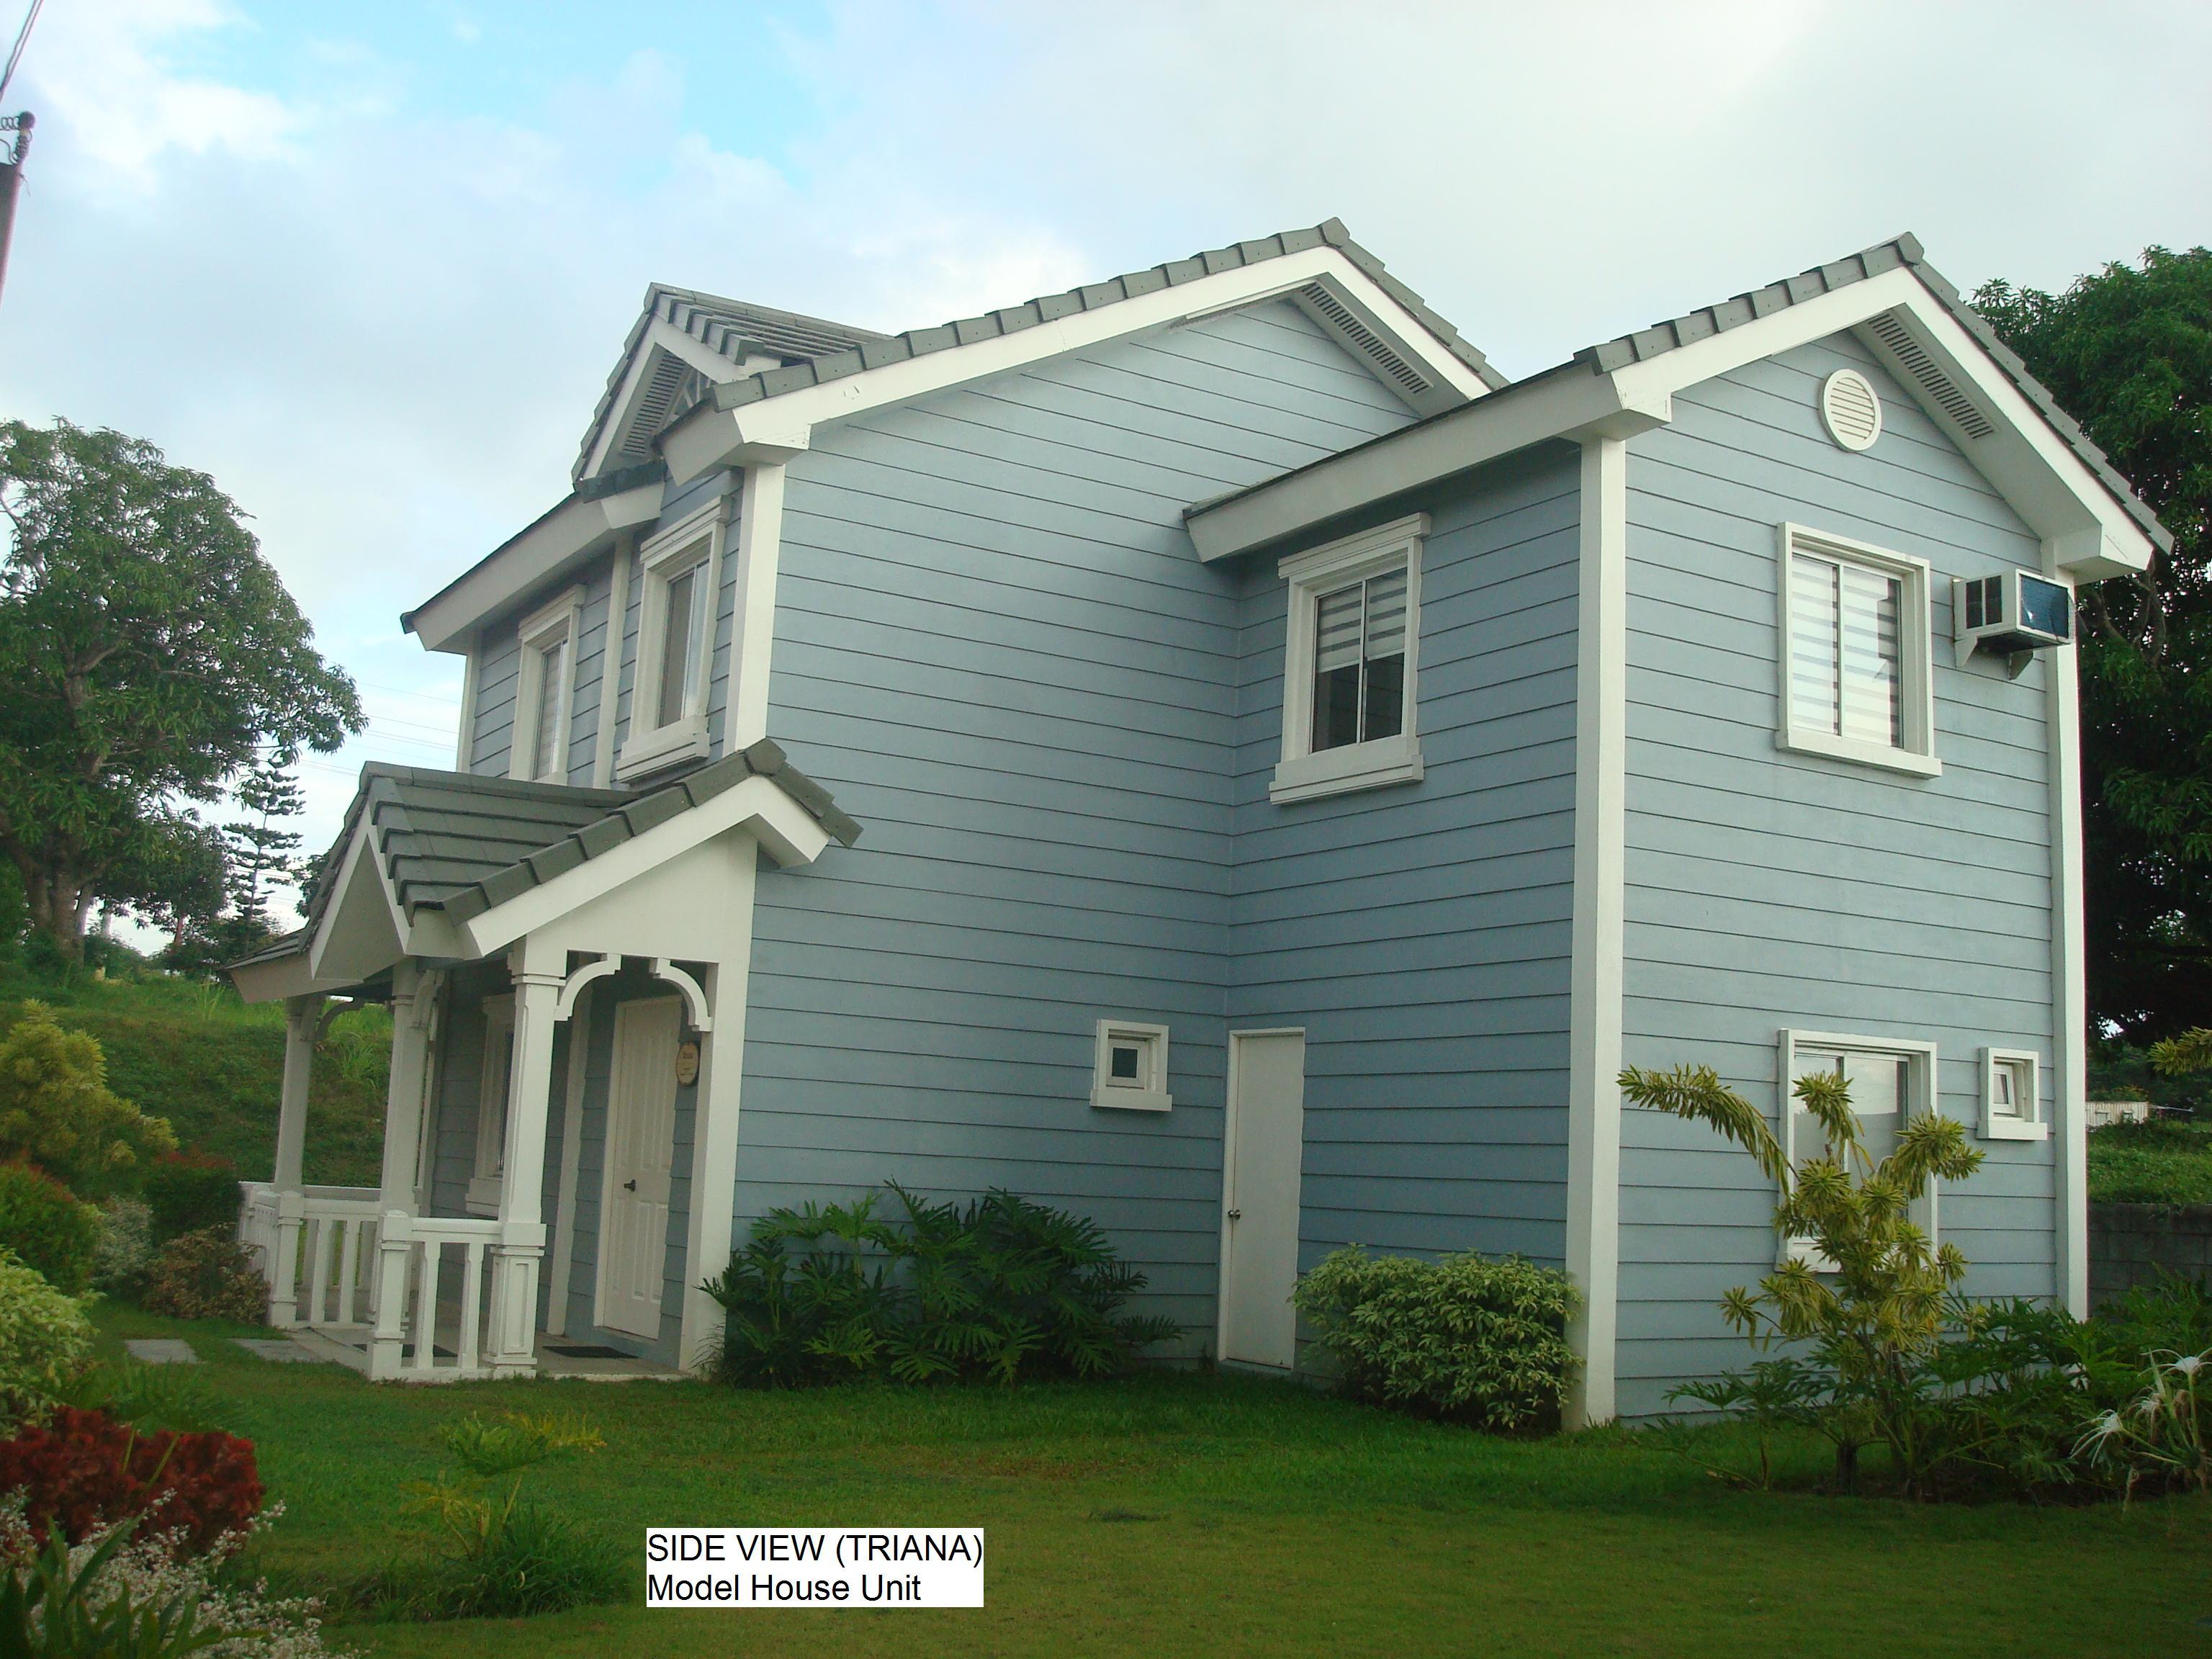 TRIANA - side view (Avida Settings Cavite)